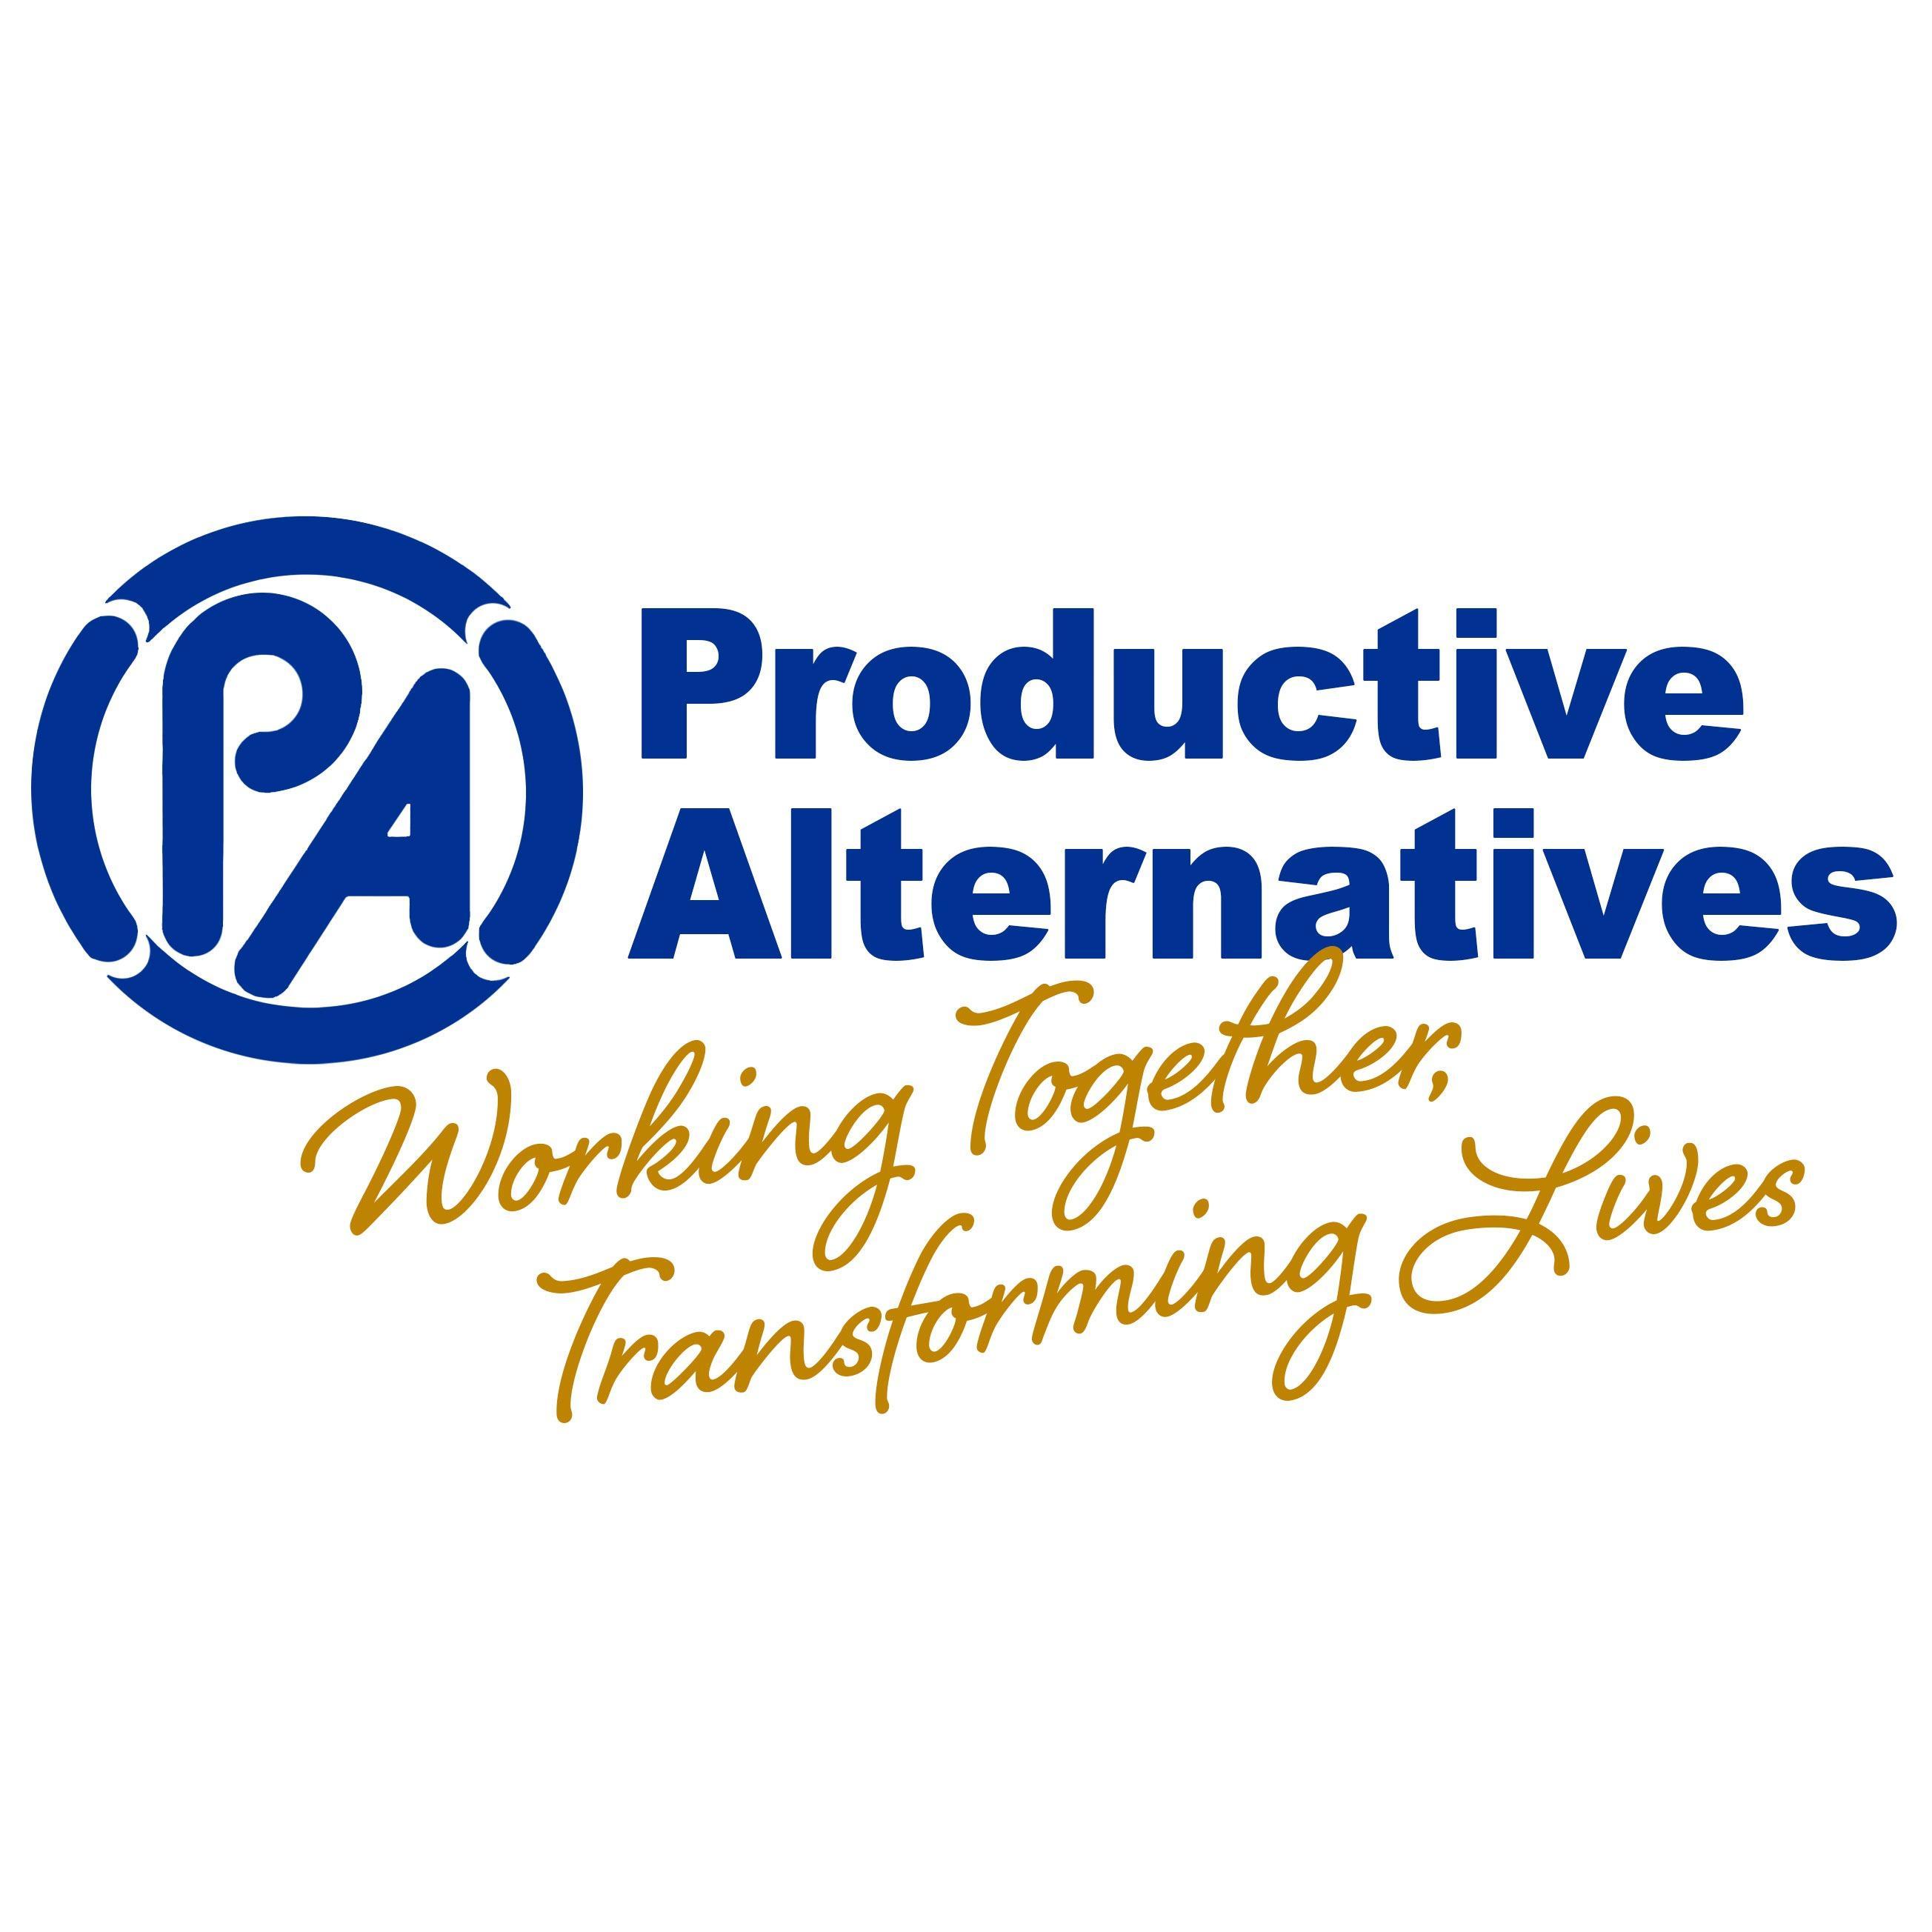 Productive Alternatives, Inc. - Parkers Prairie - Alexandria, MN 56308 - (320)763-4101 | ShowMeLocal.com